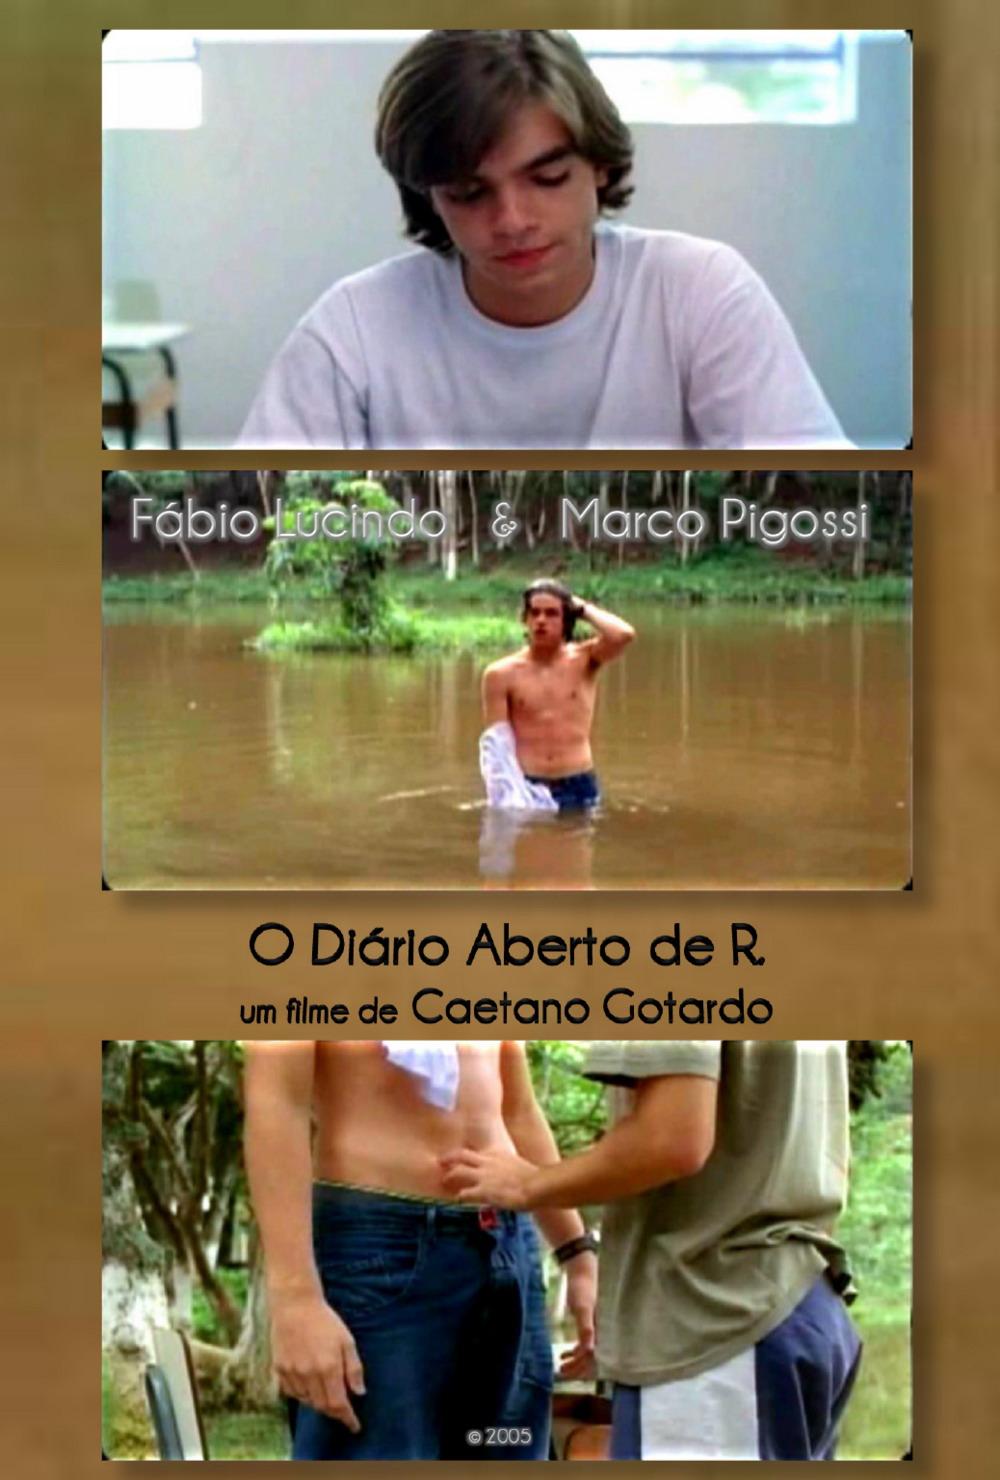 O Diário Aberto de R (2005) The Open Diary of R